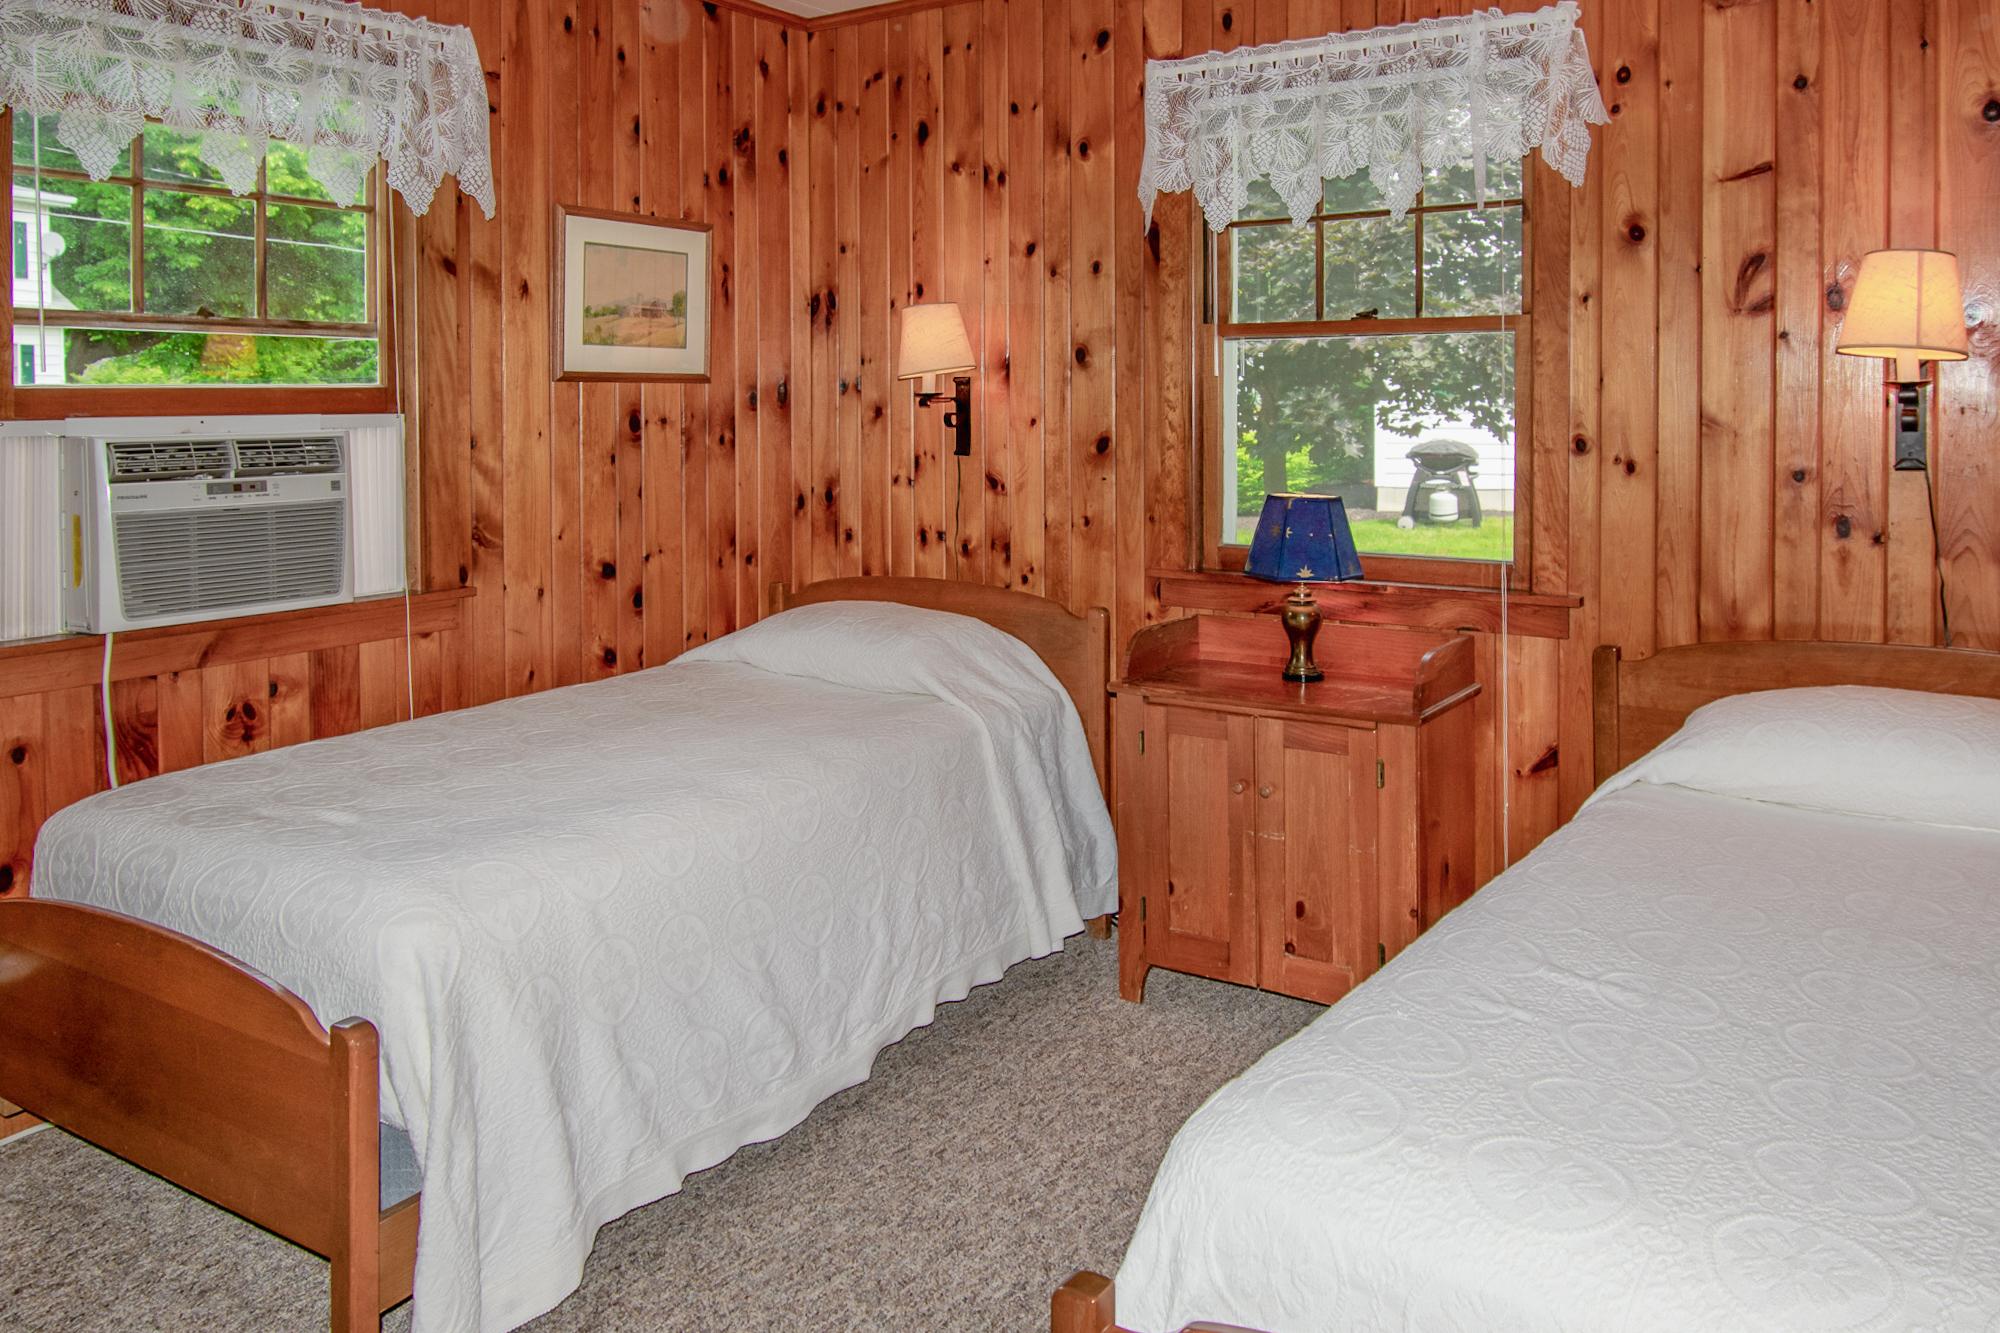 Takundewide Cottage #11twinbrJul2019DSC_0397